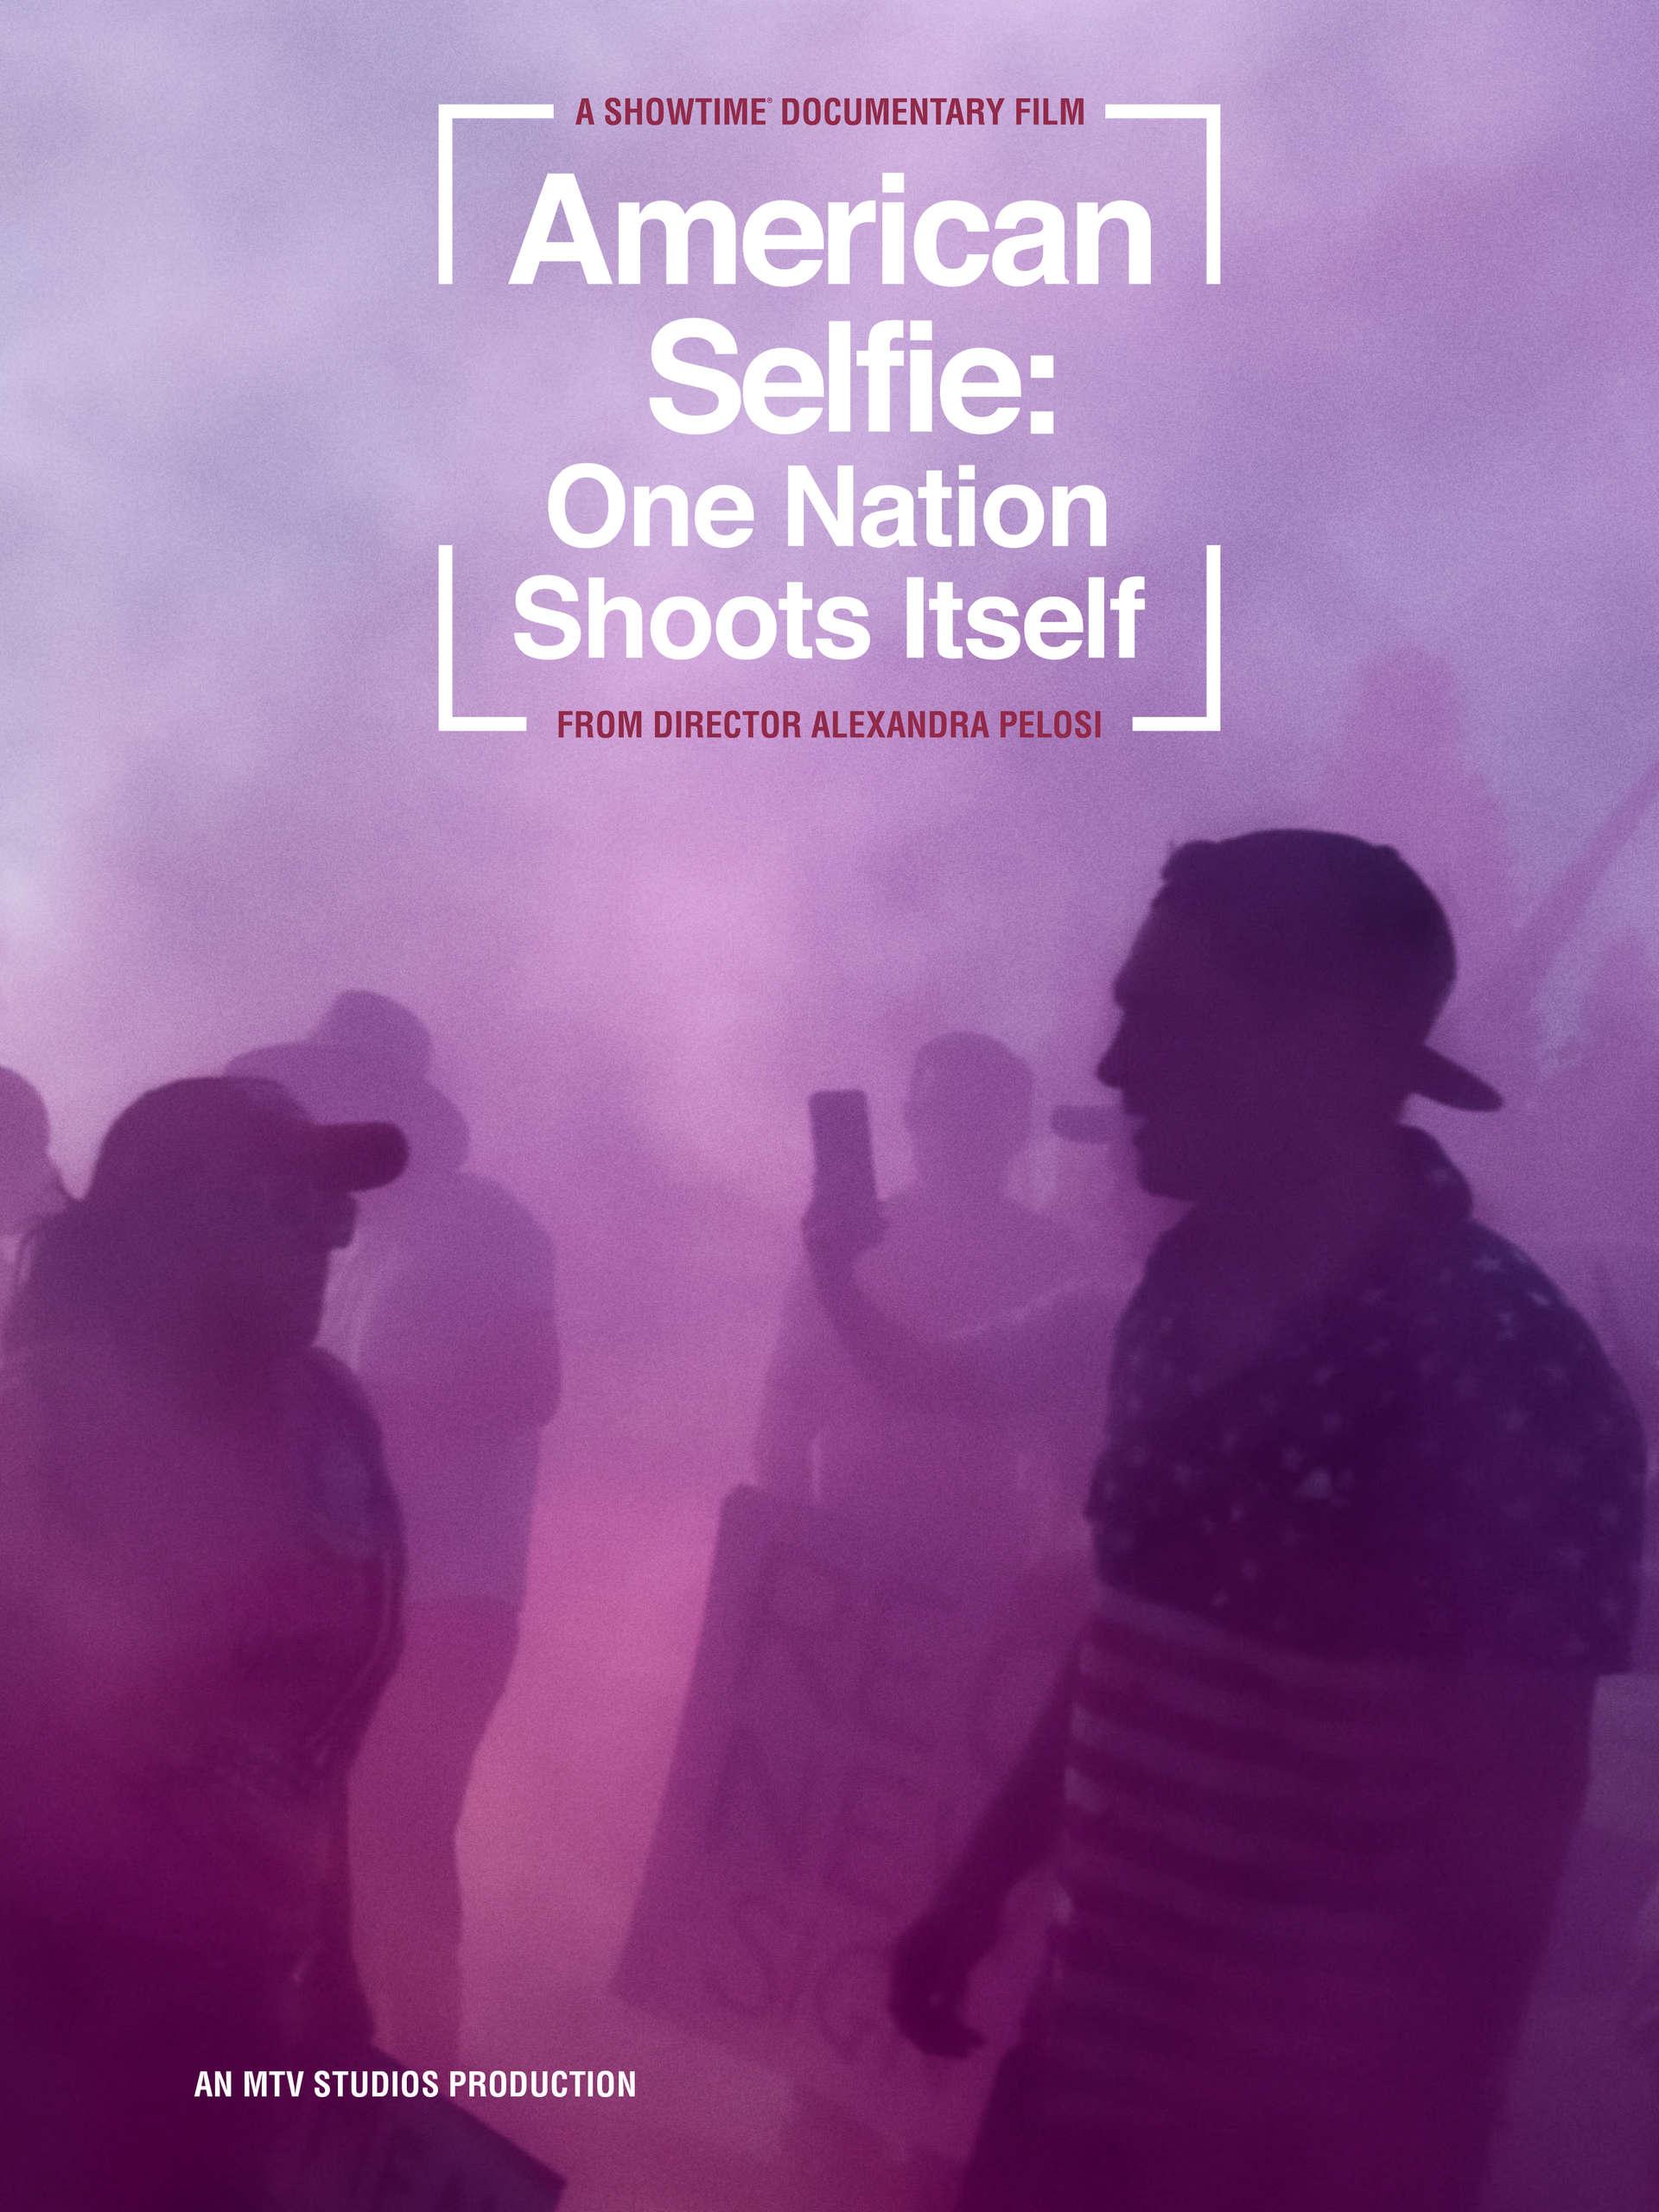 American Selfie: One Nation Shoots Itself kapak